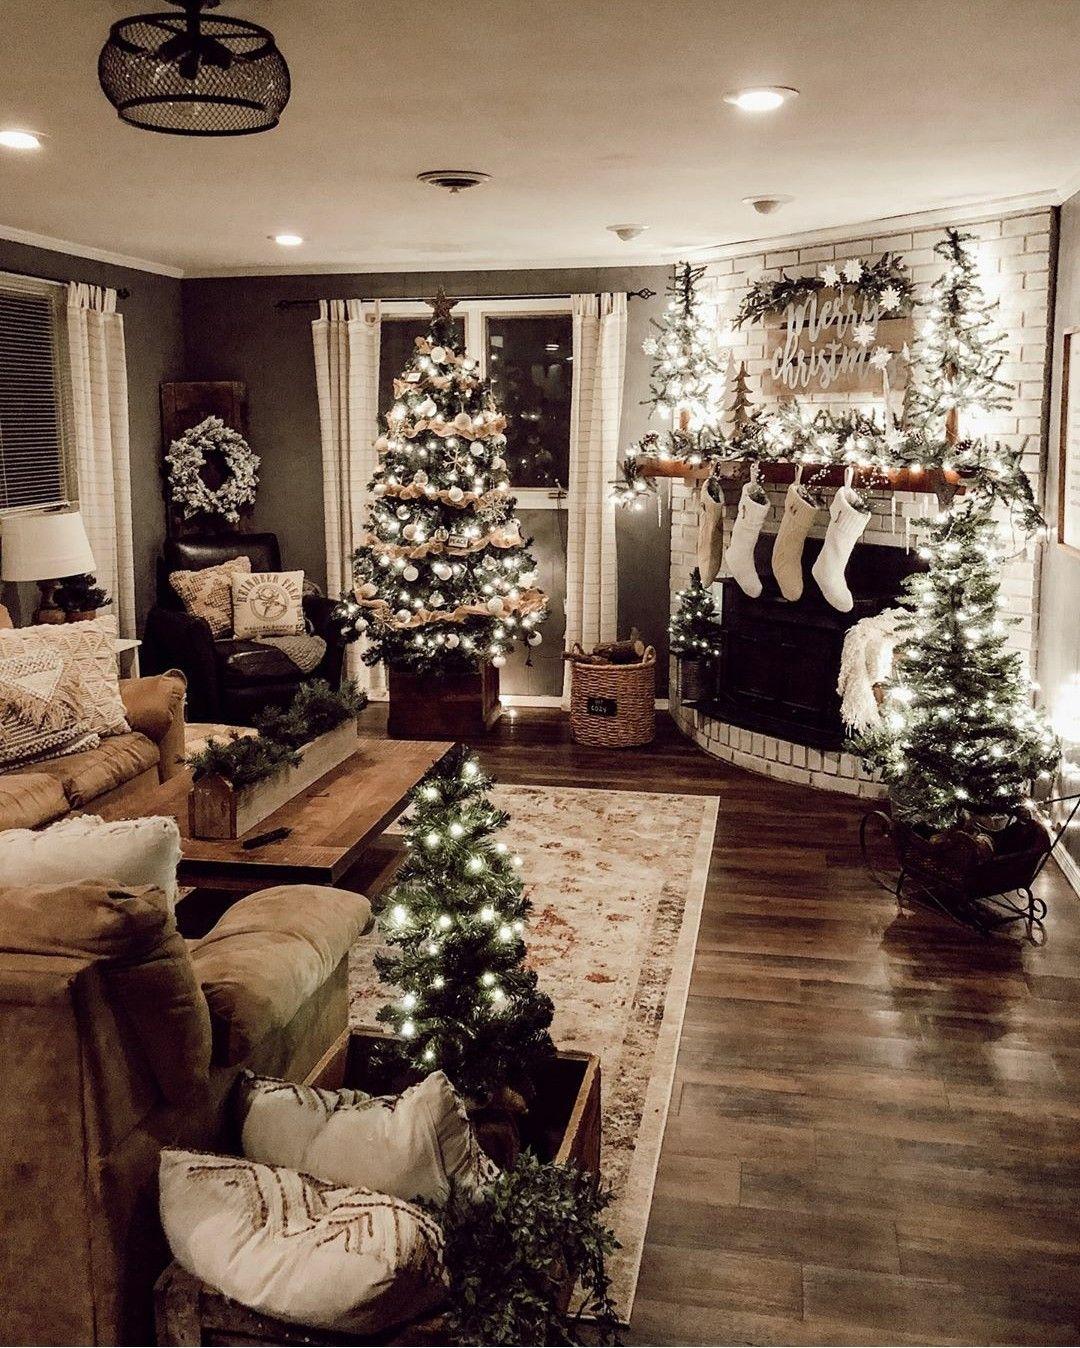 Instagram Allycatt14 Christmas Room Indoor Christmas Rustic Christmas